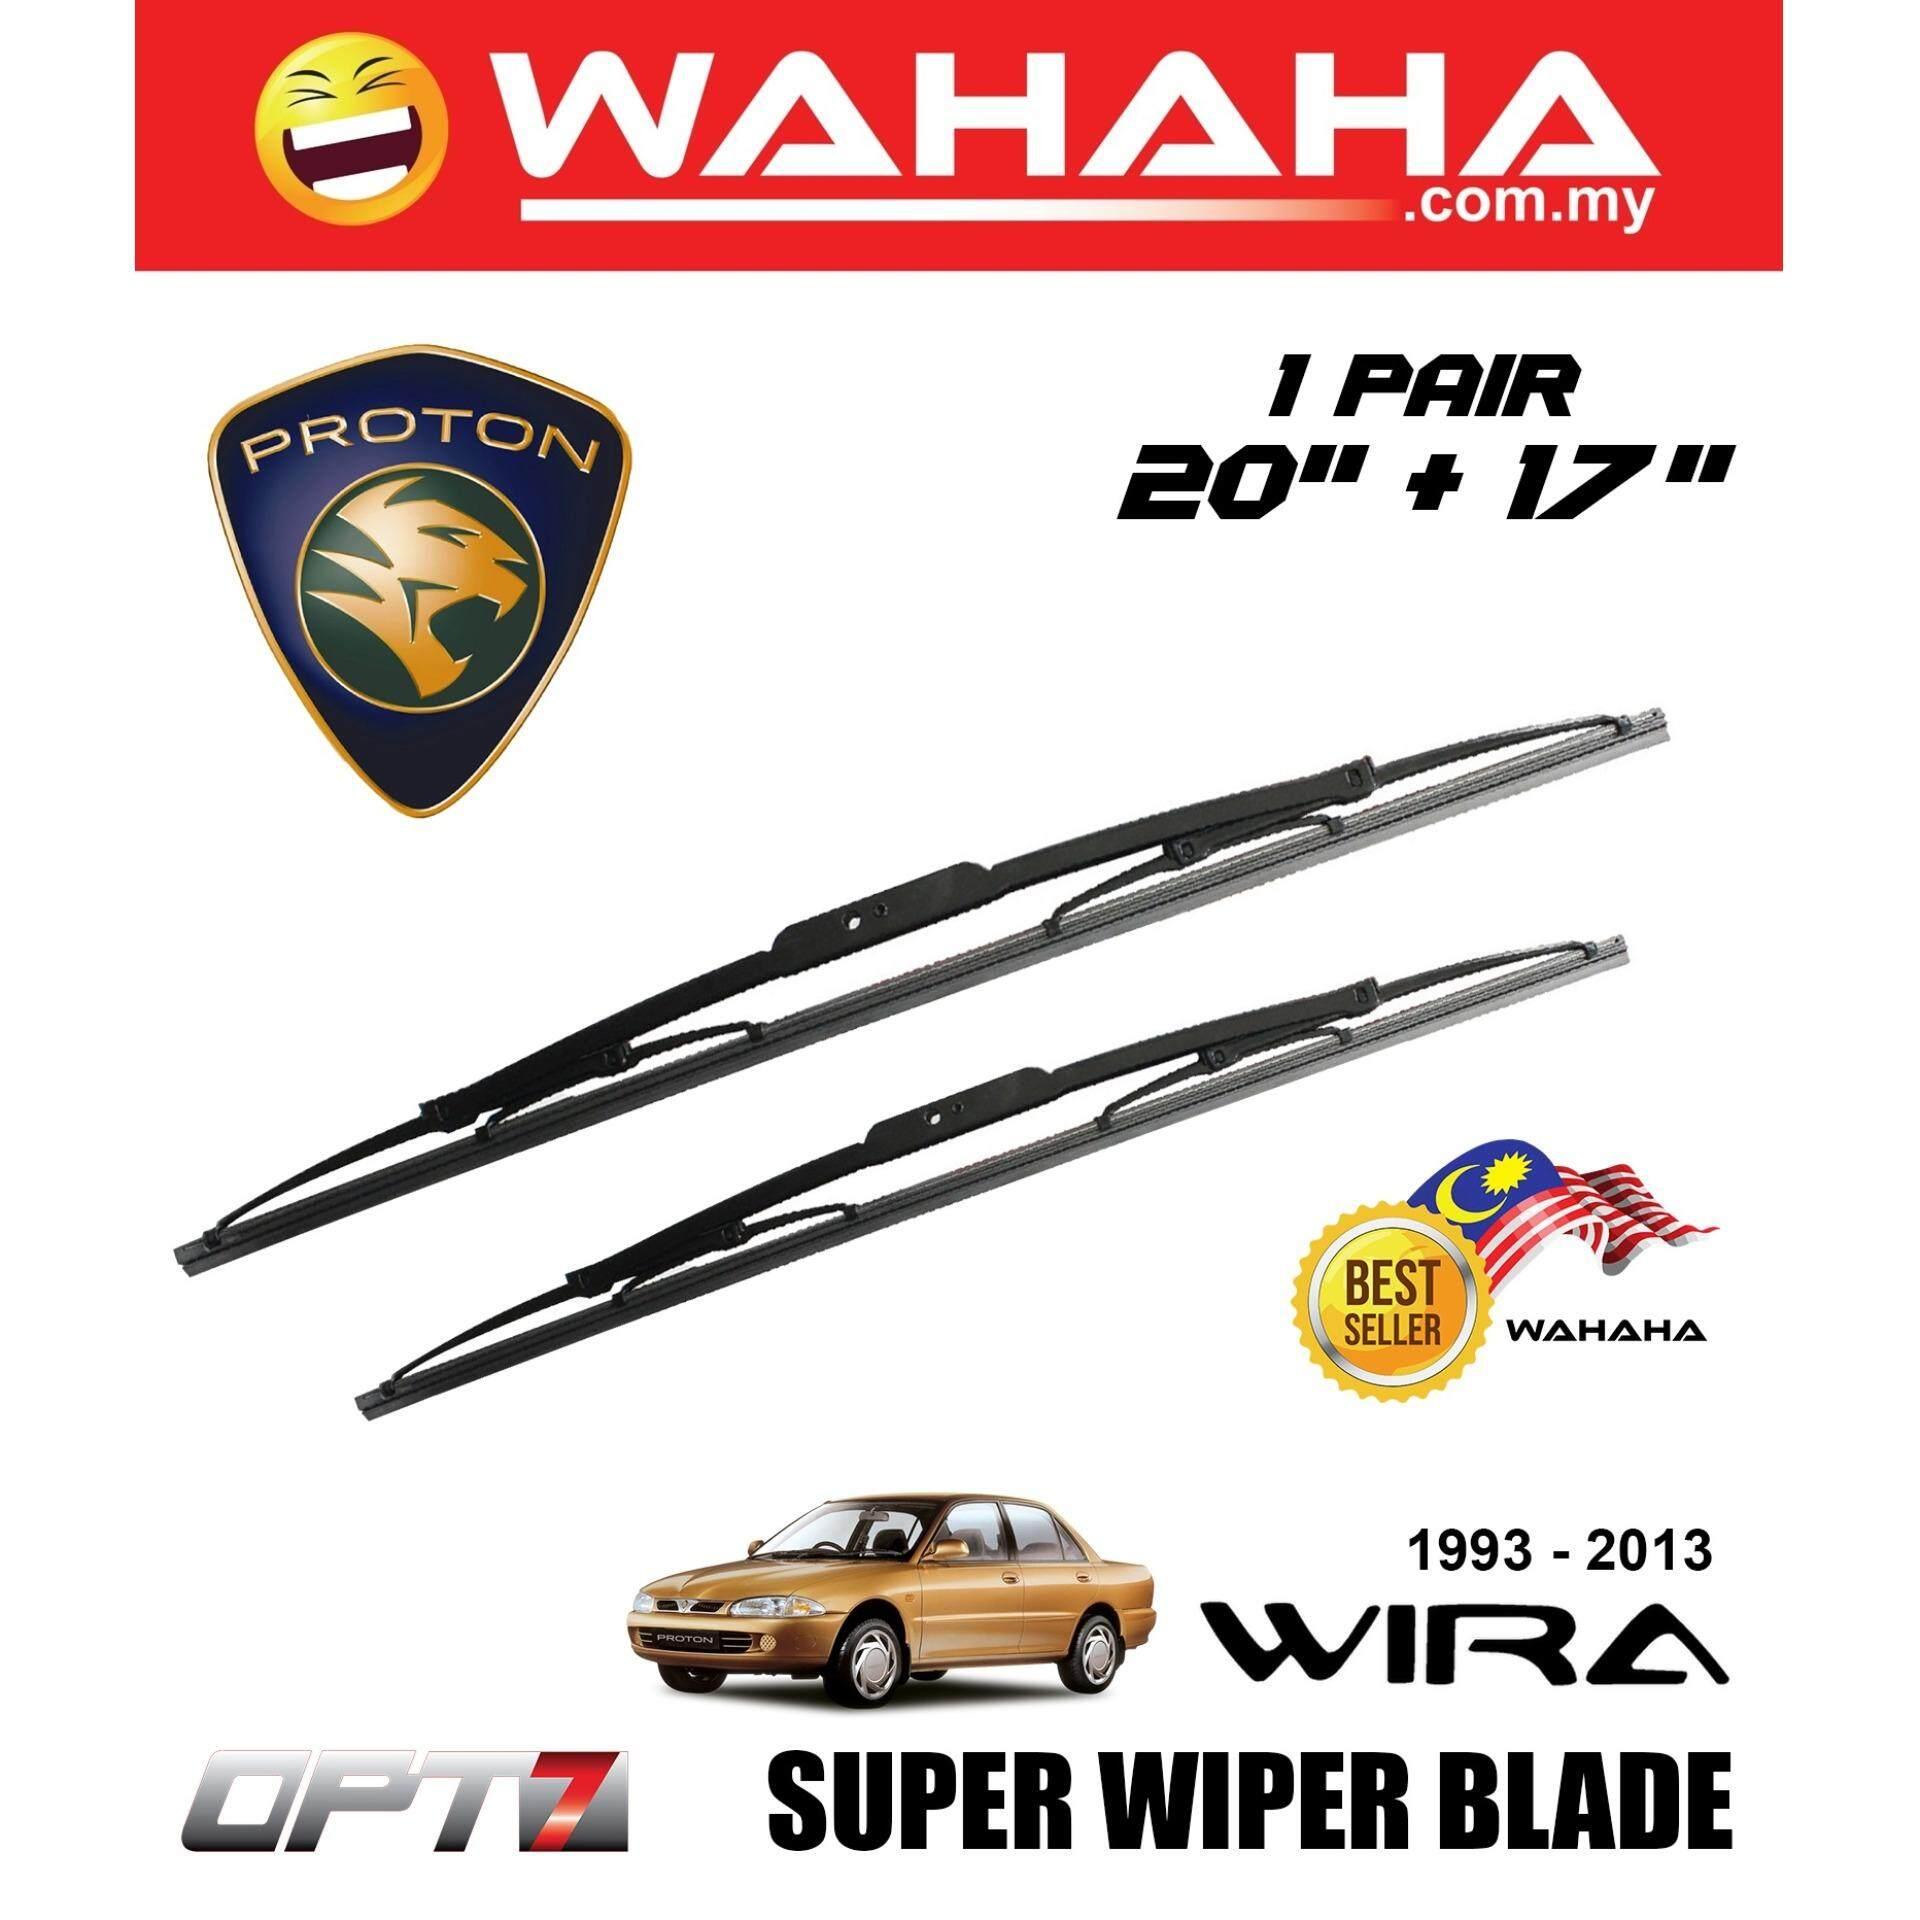 PROTON WIRA OPT7 Car Window Windshield Super Wiper Blade 20 +17